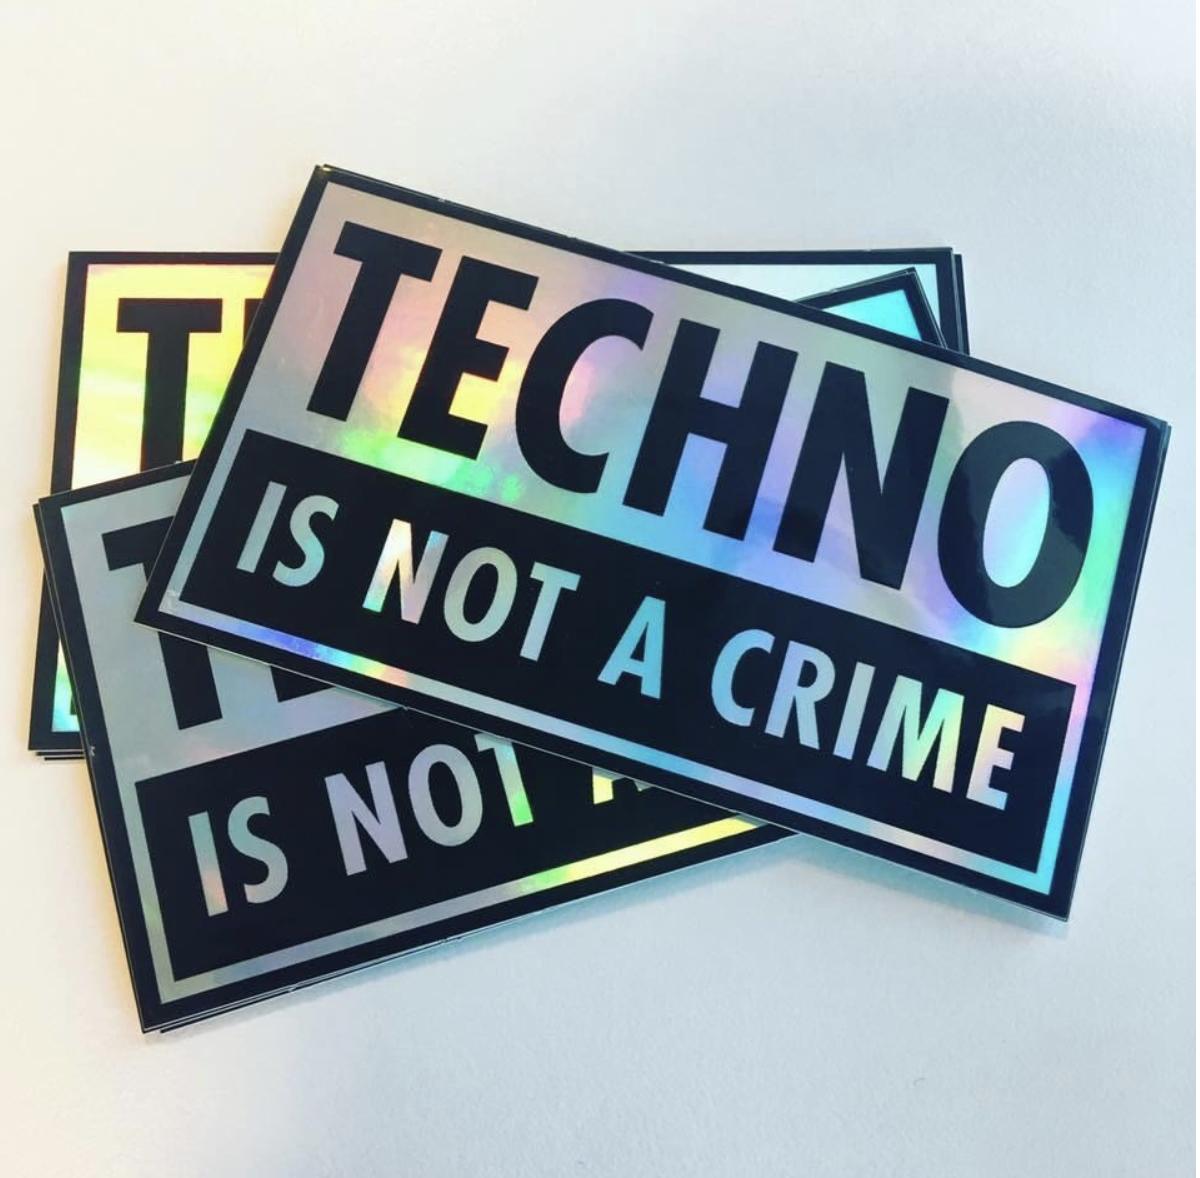 A Little Techno Never Hurt Nobody Techno Techno Quotes Techno Music